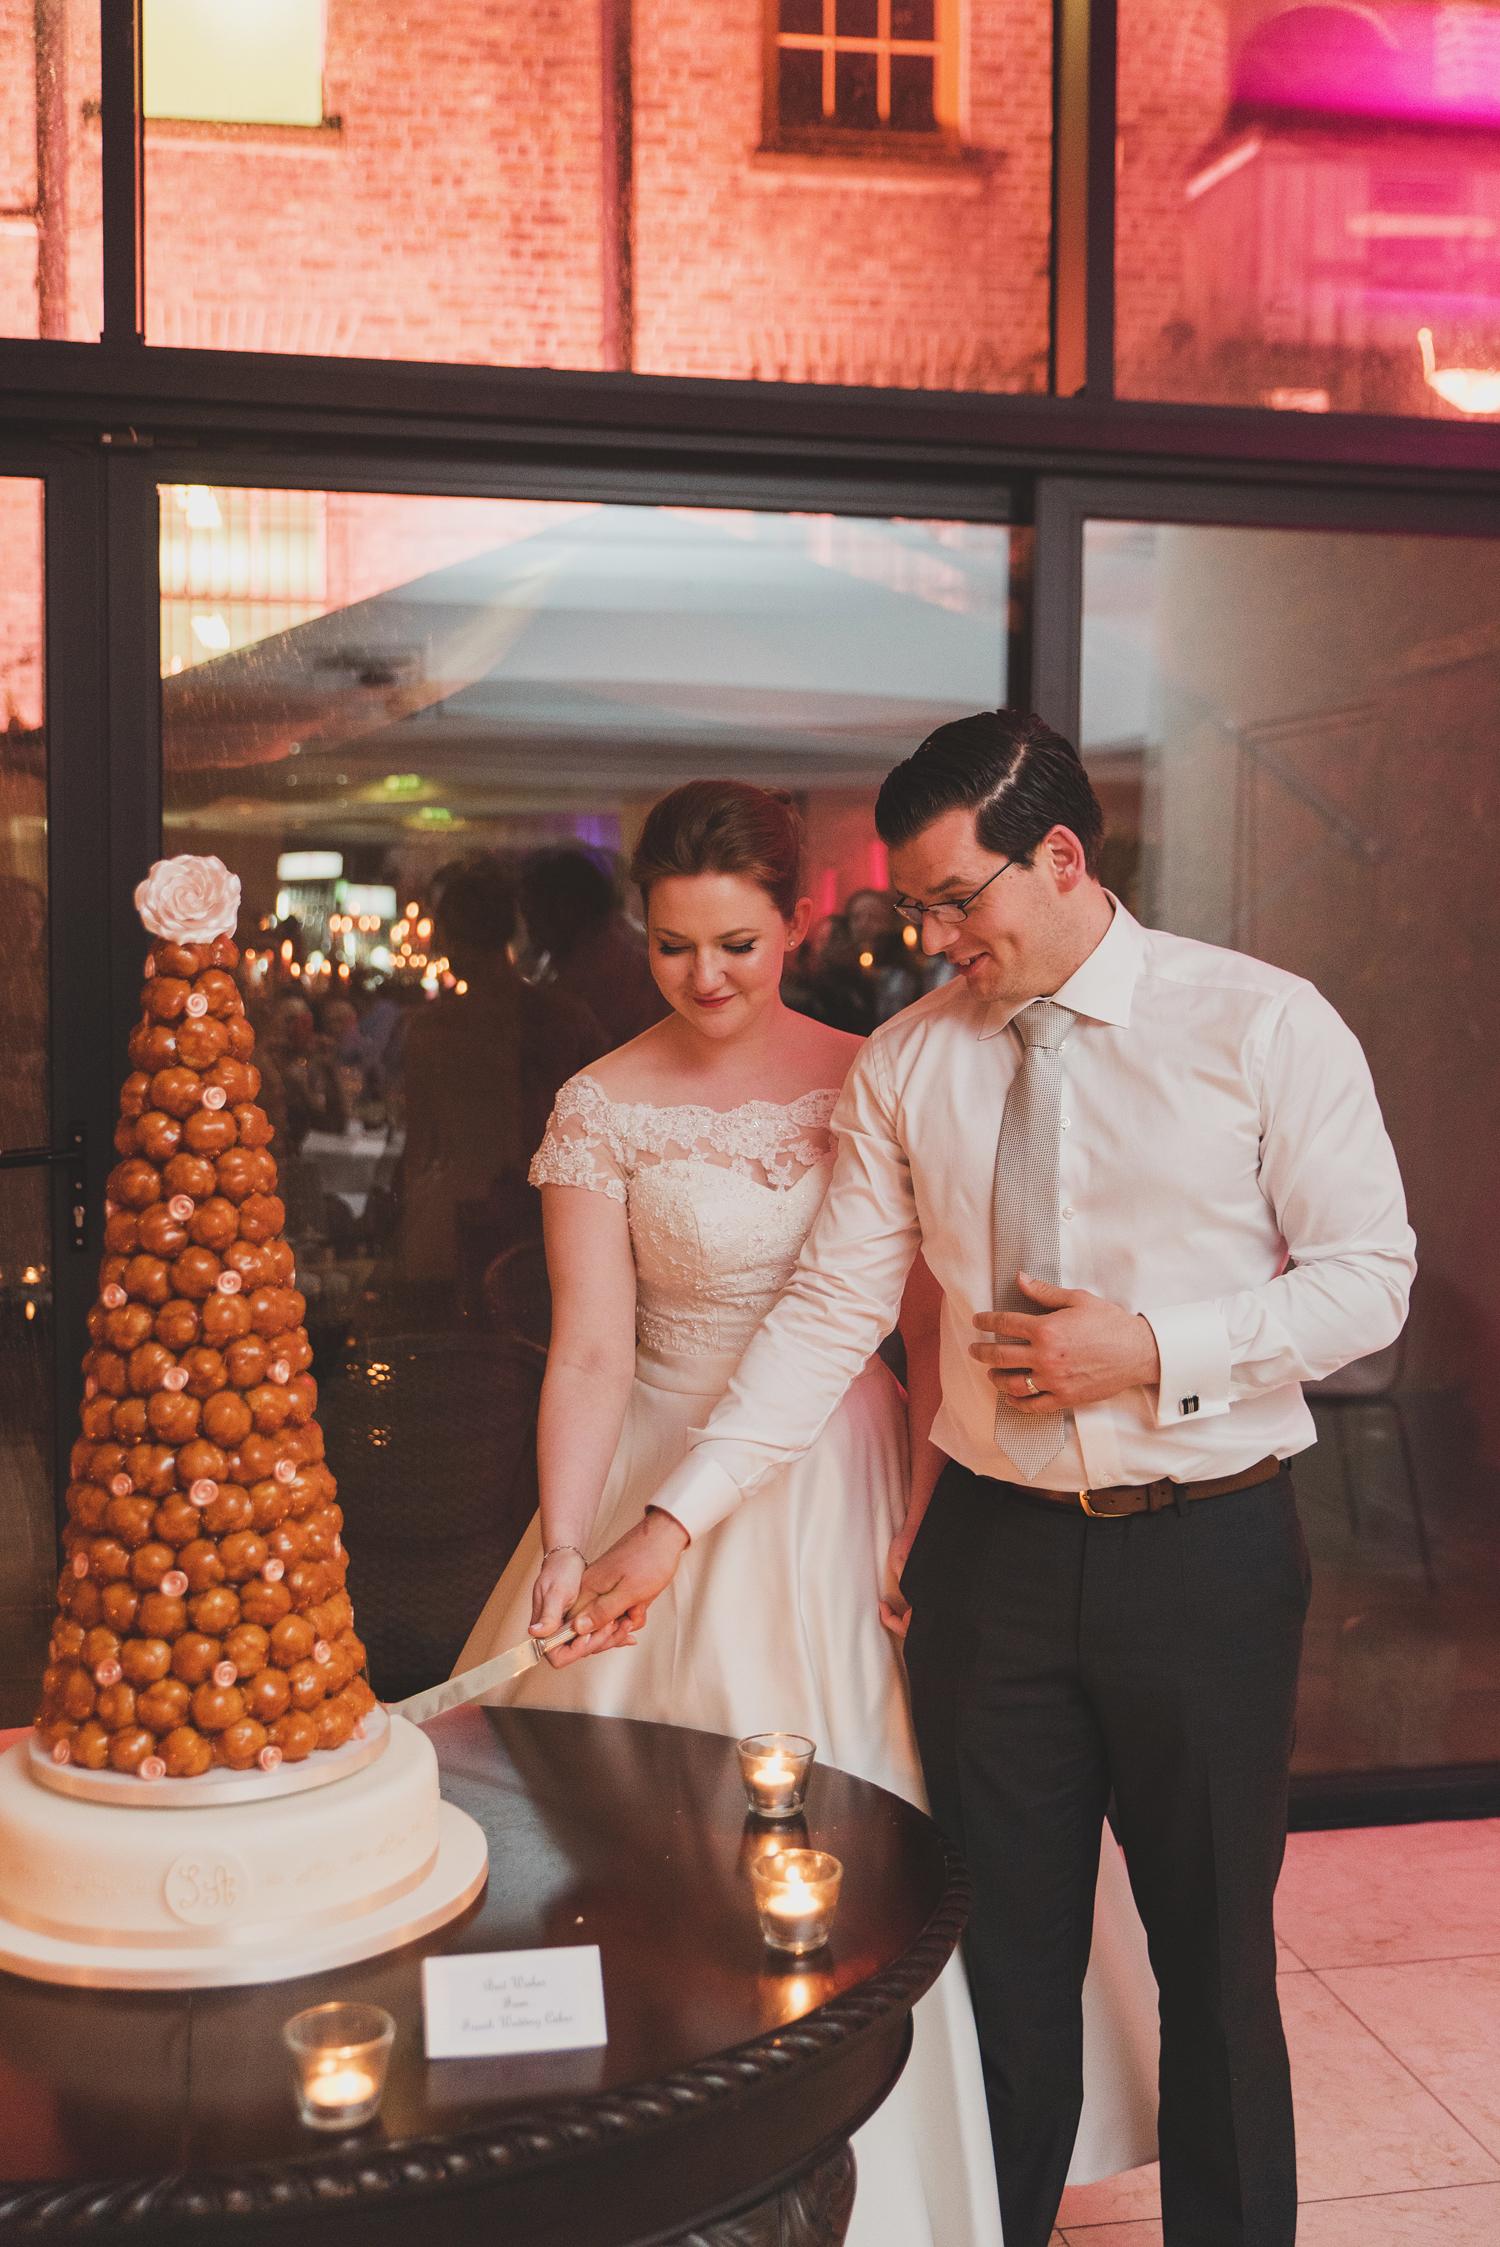 Wedding-in-Dublin-City-Centre-Morrison-Hotel-Wedding-Photography-Dublin-Stylish-City-Wedding283.jpg